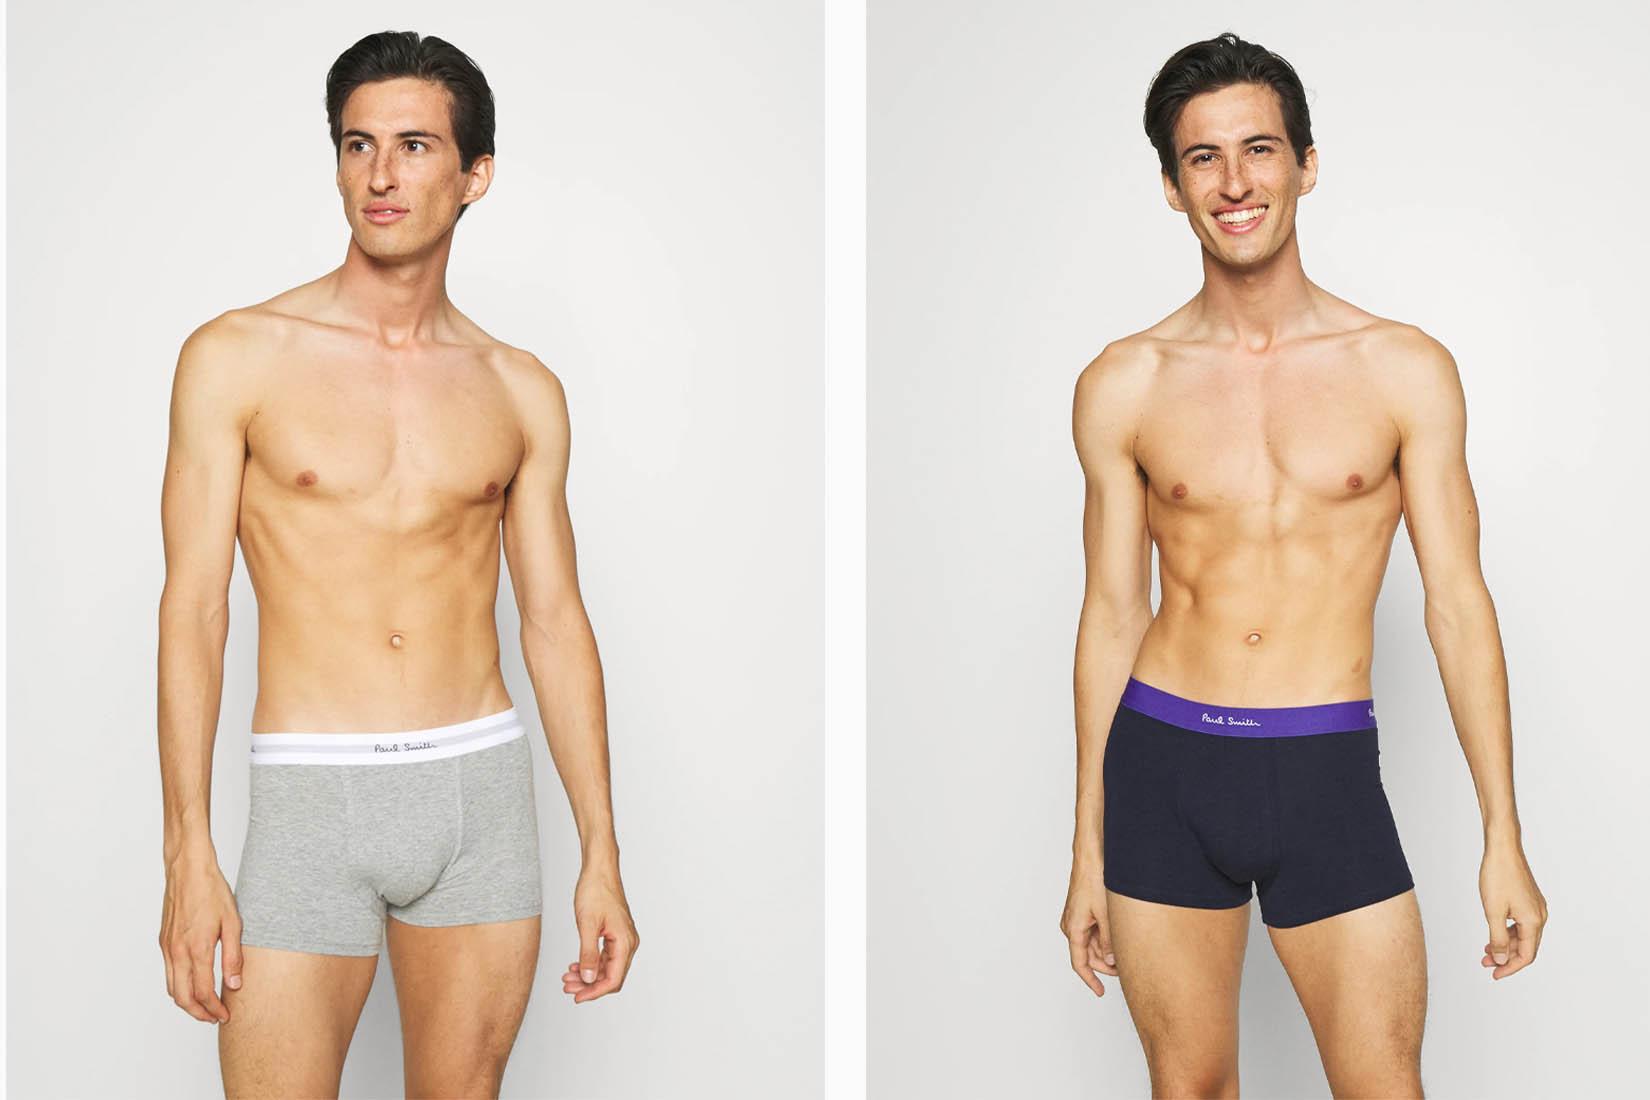 best underwear men paul smith review Luxe Digital